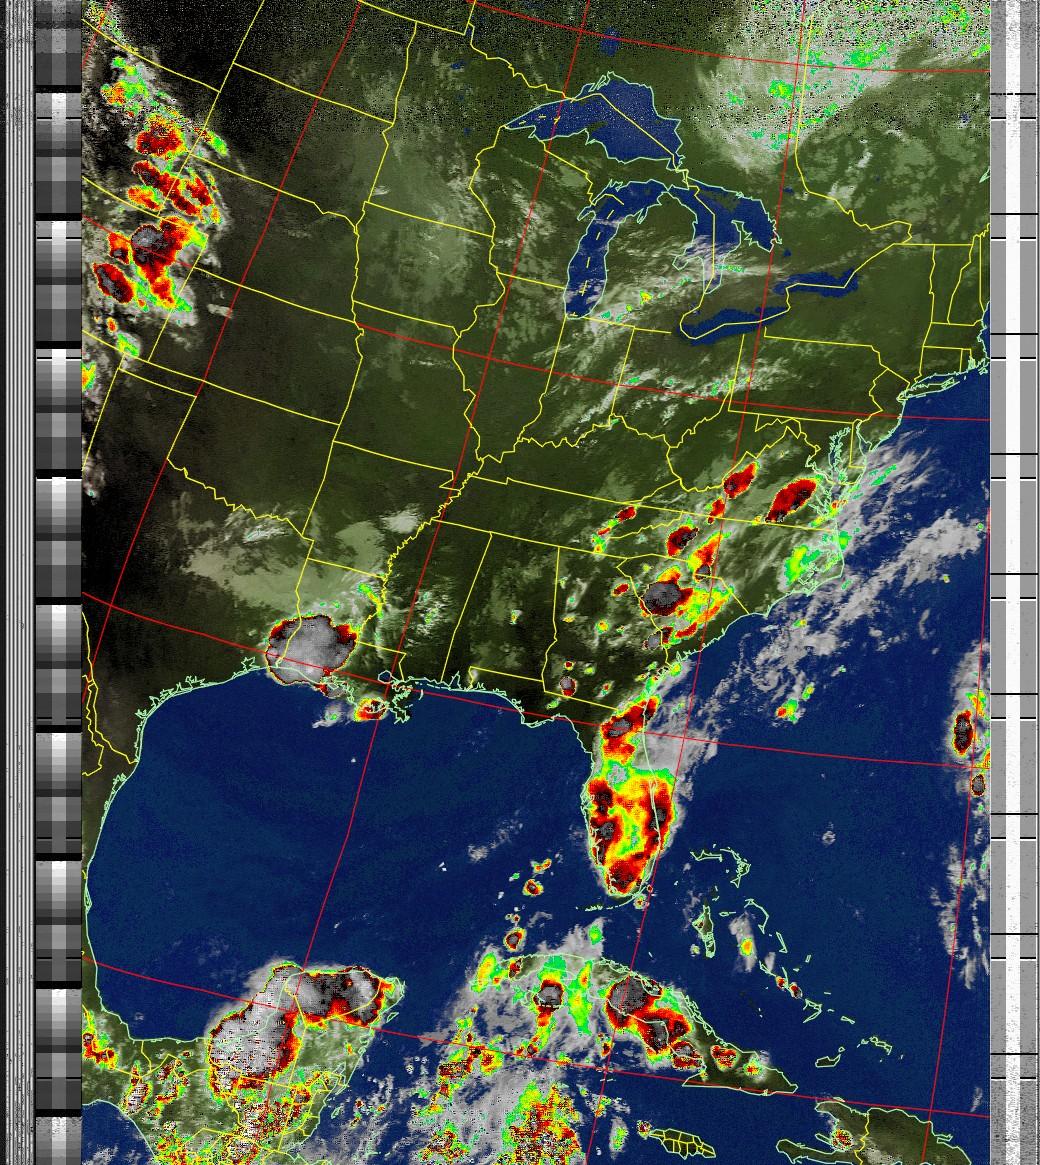 Satellite Image: NOAA 19 05-08-2020 18:15. Max Elevation: 29 Degrees. #NOAA #weather #TXlisteningpostimages #noaasatellite #RTLSDR #raspberrypipic.twitter.com/60g4h2eI4h